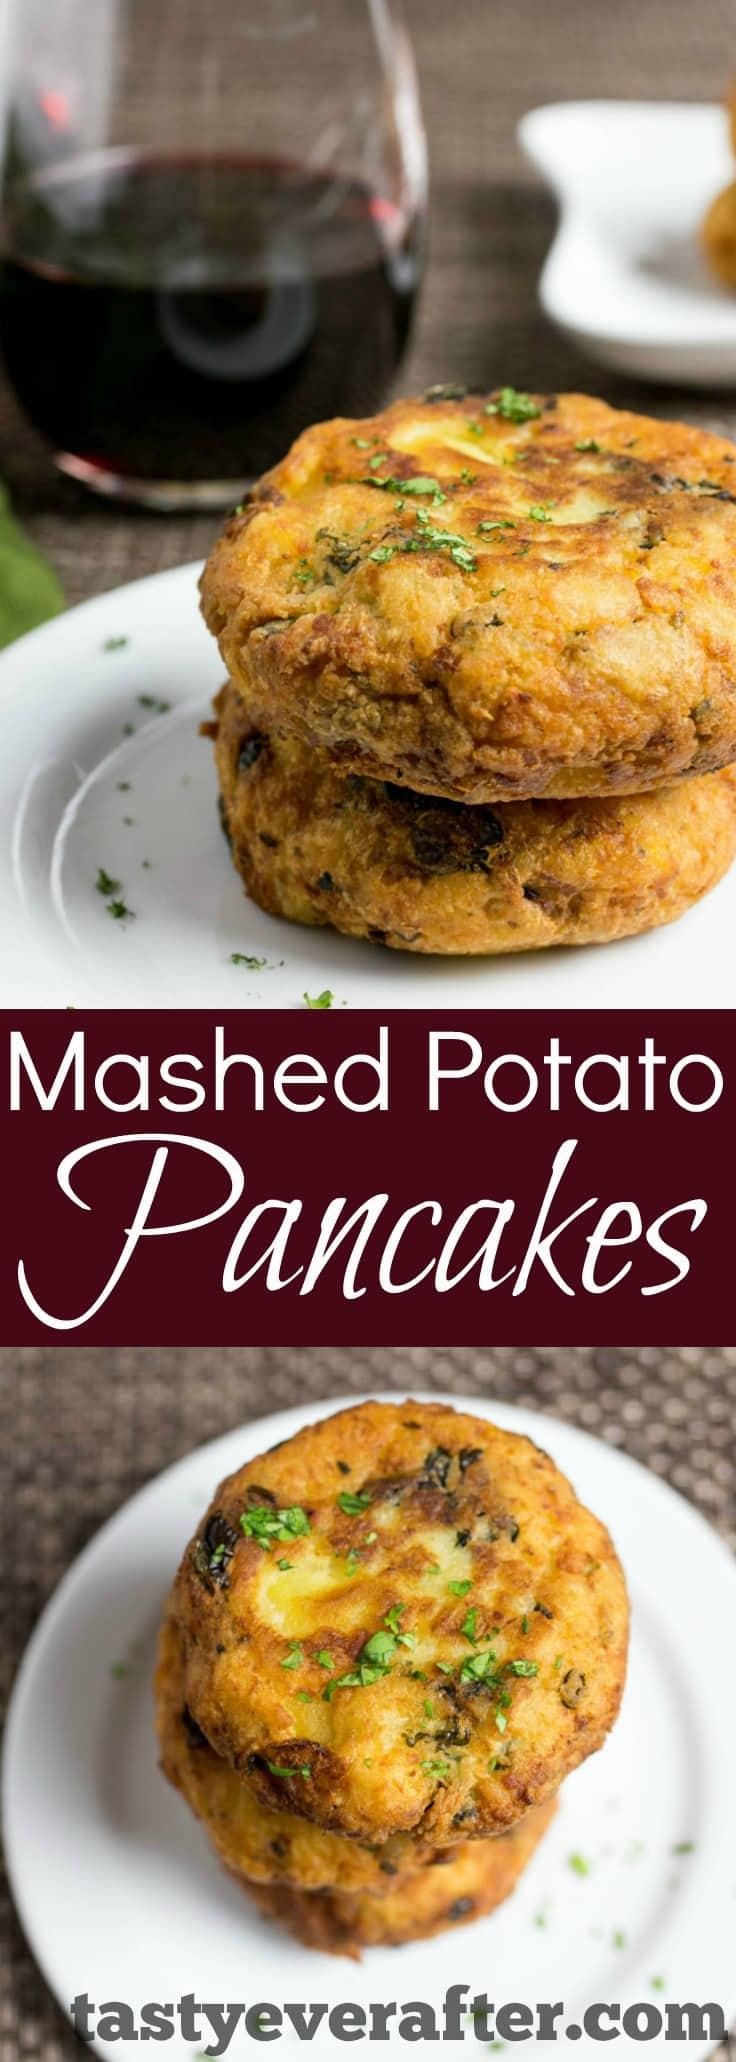 MashedPotatoePancakesPIN2 - Leftover Mashed Potato Pancakes Recipe